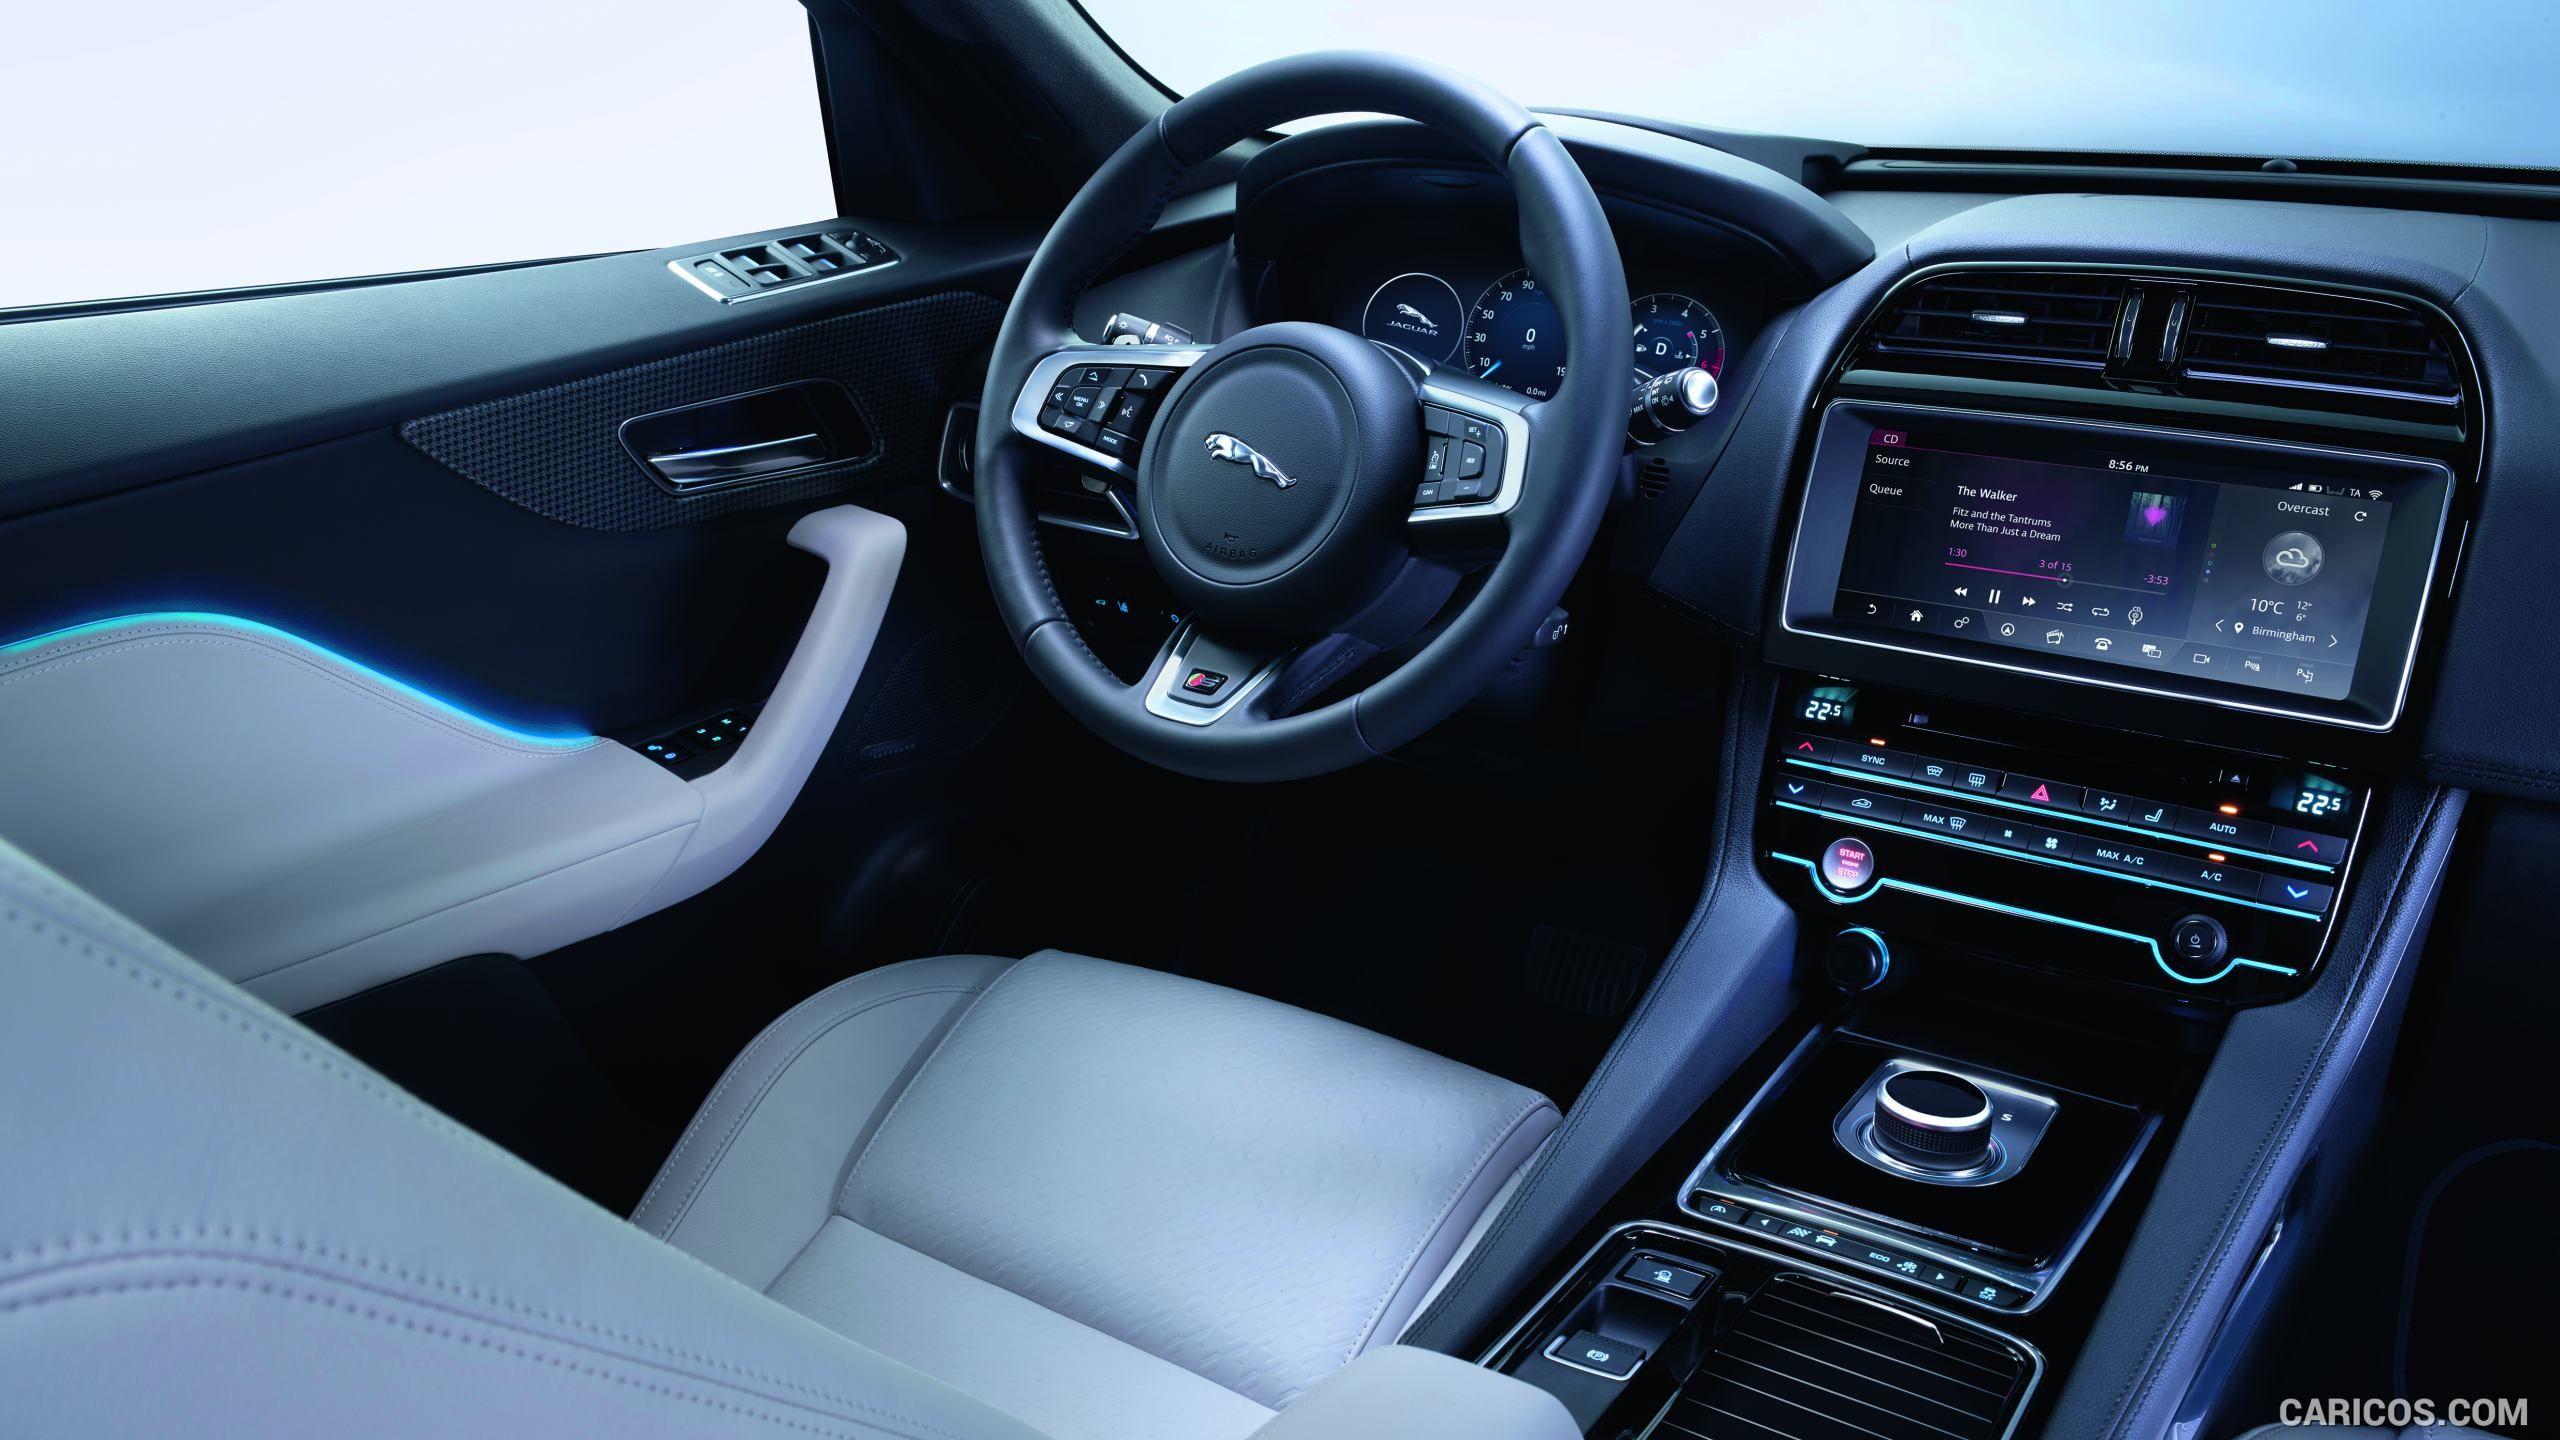 2017 Jaguar F Pace Wallpaper Jaguar Suv Interior Jaguar Suv Jaguar Fpace